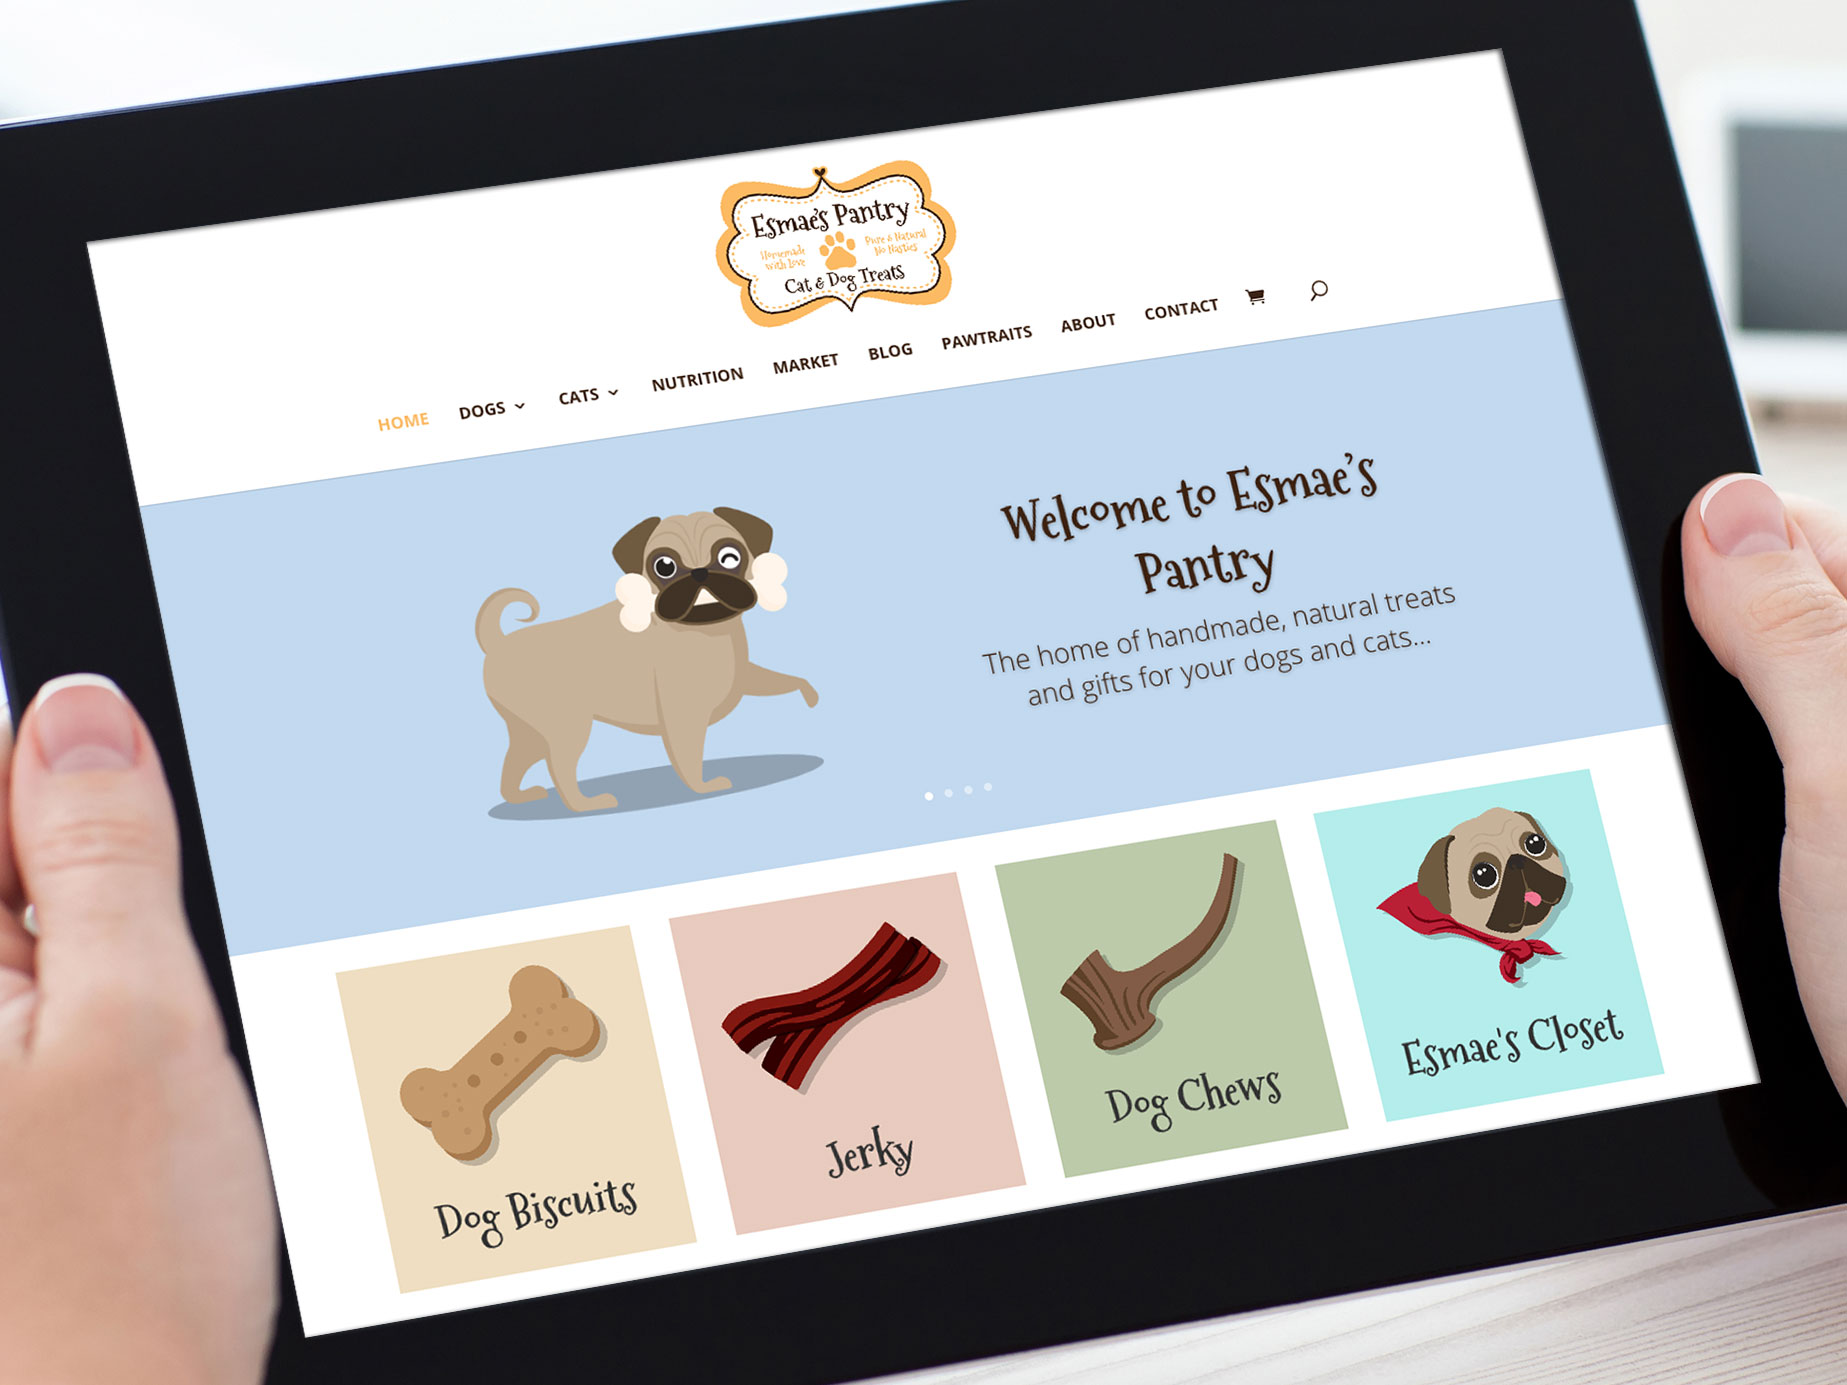 Esmaes Pantry Website Design